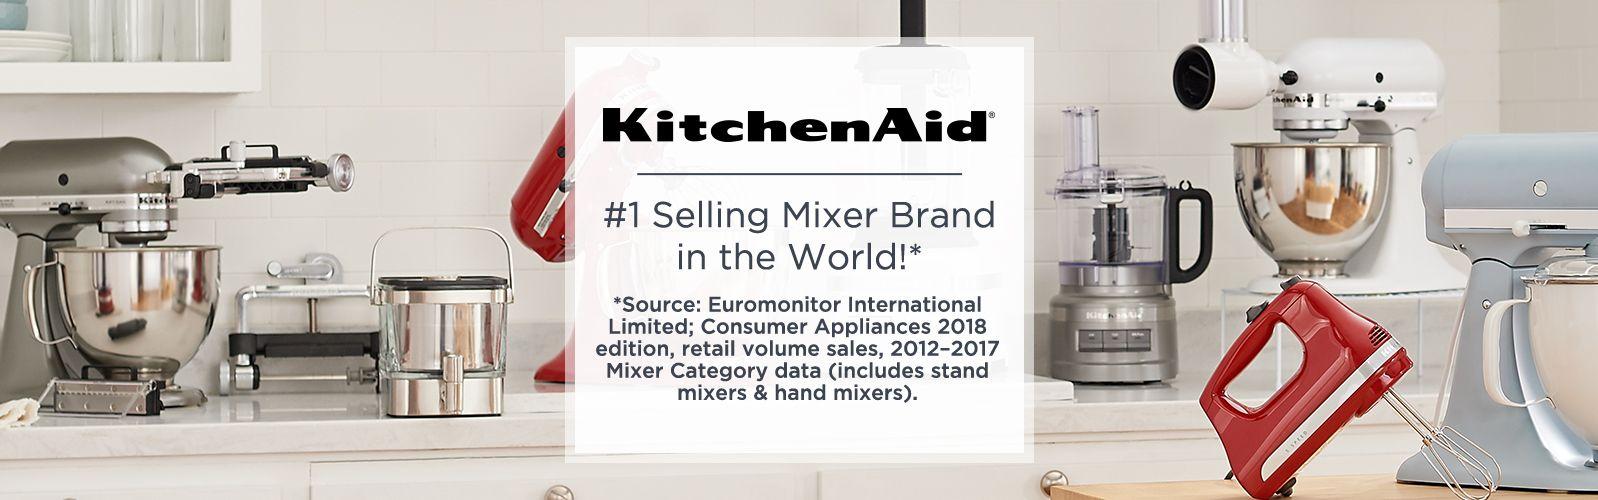 ordinary Kitchenaid Tv Infomercial Part - 17: KitchenAid